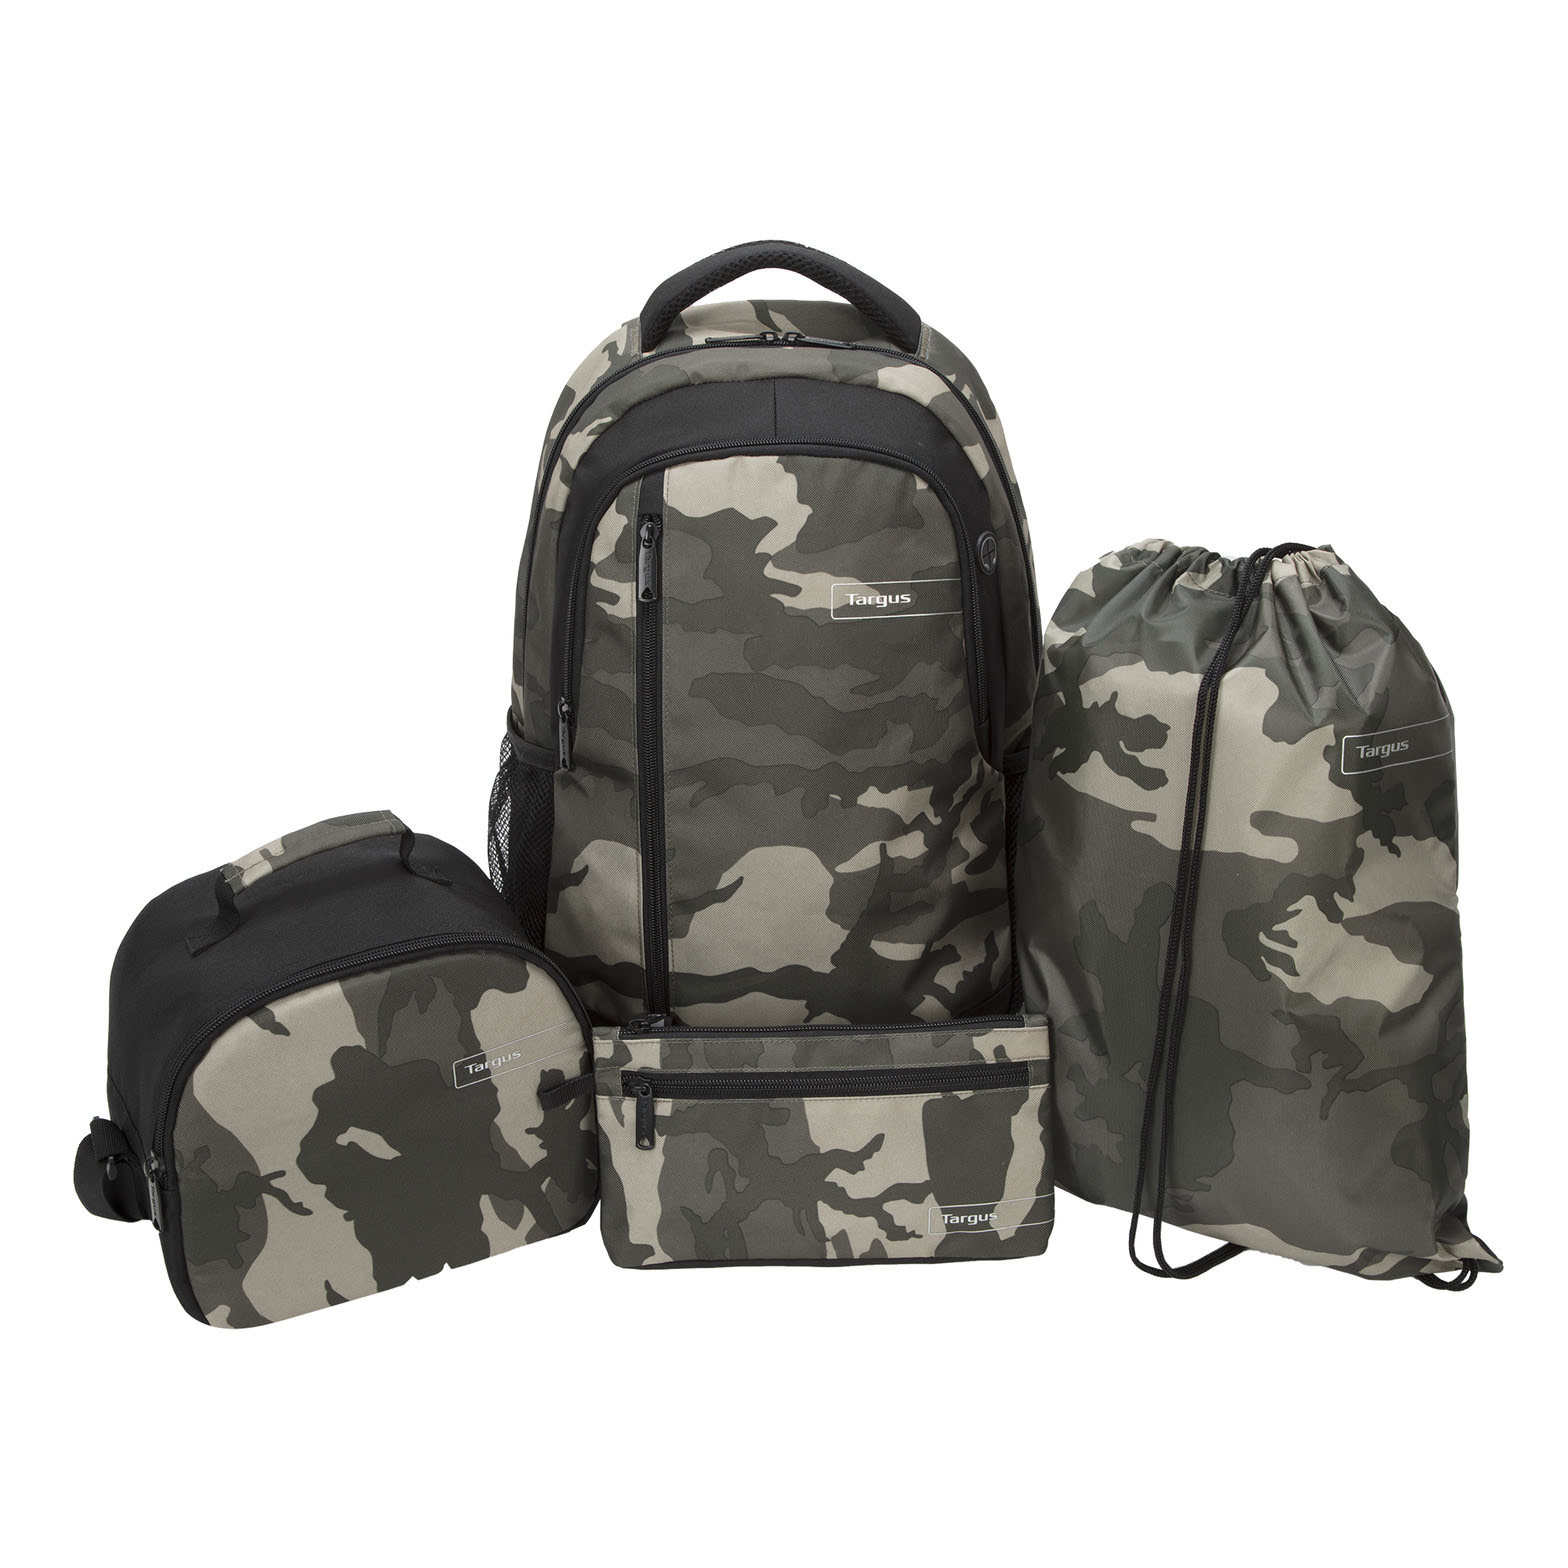 TSB96305EU Sport Green Camo Backpack Bundle